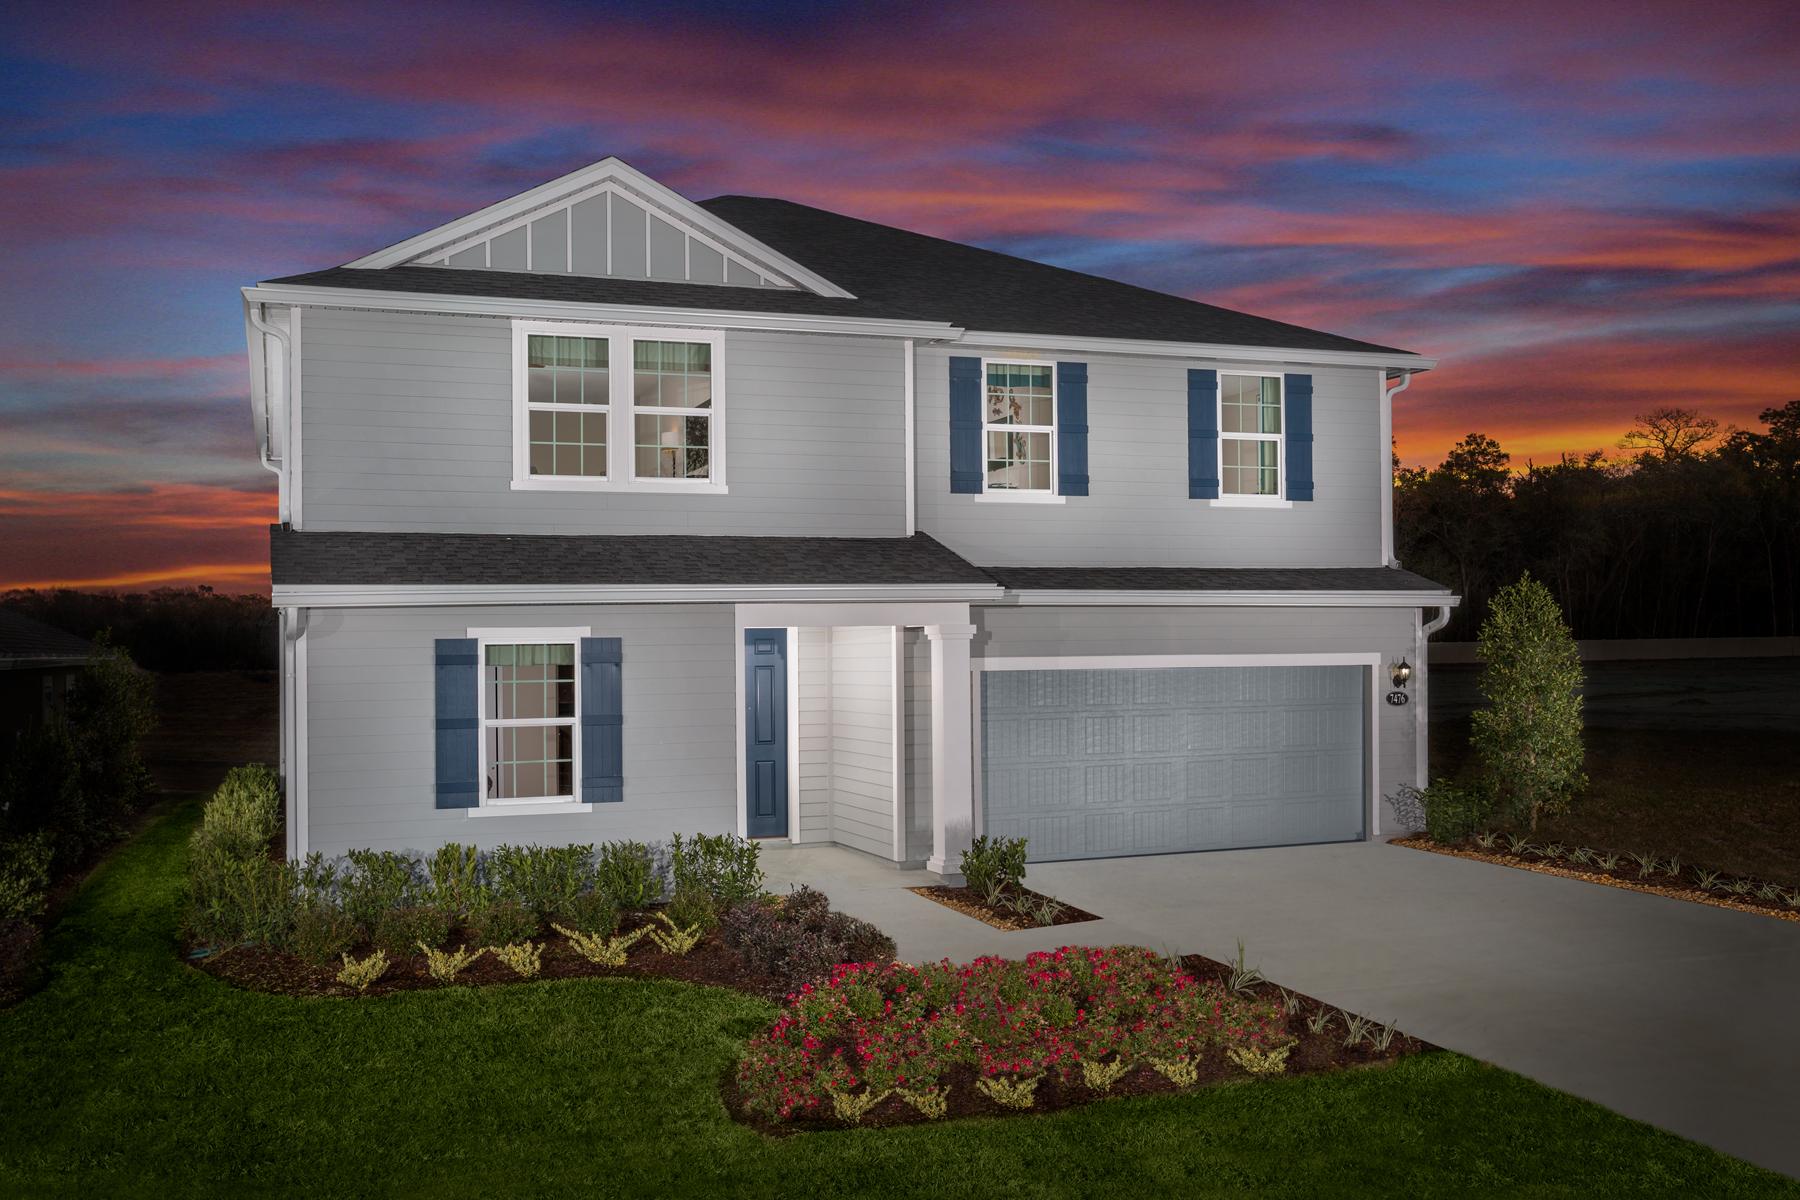 KB Home Announces the Grand Opening of Copperleaf in Mandarin – Copperleaf Homes Floor Plans